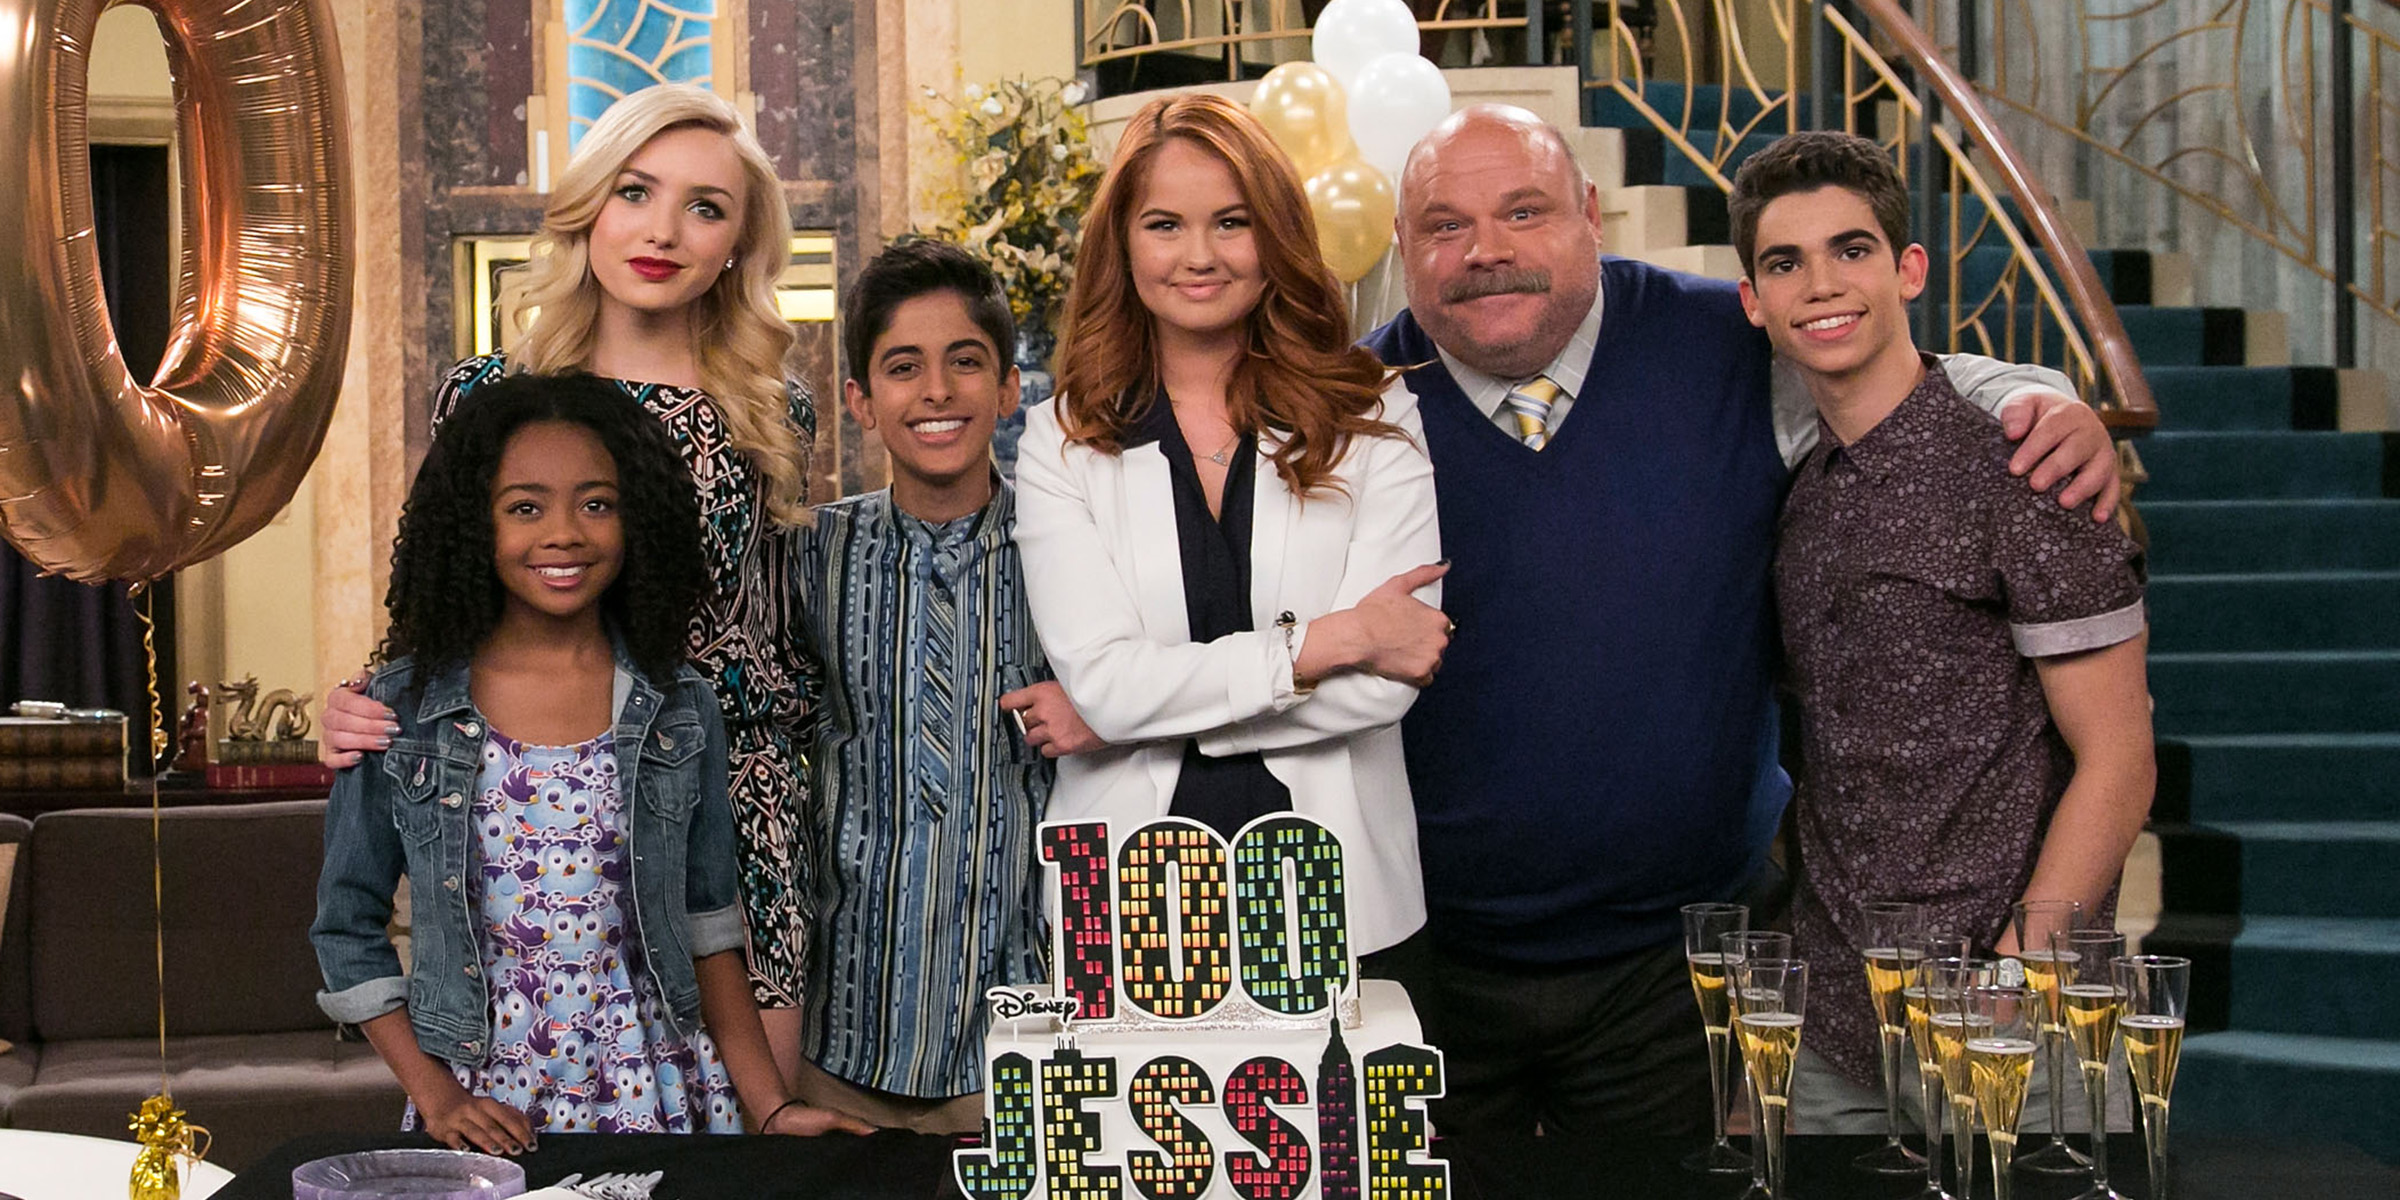 Cameron Boyce S Former Jessie Co Stars Share Heartwarming Memories Of Him